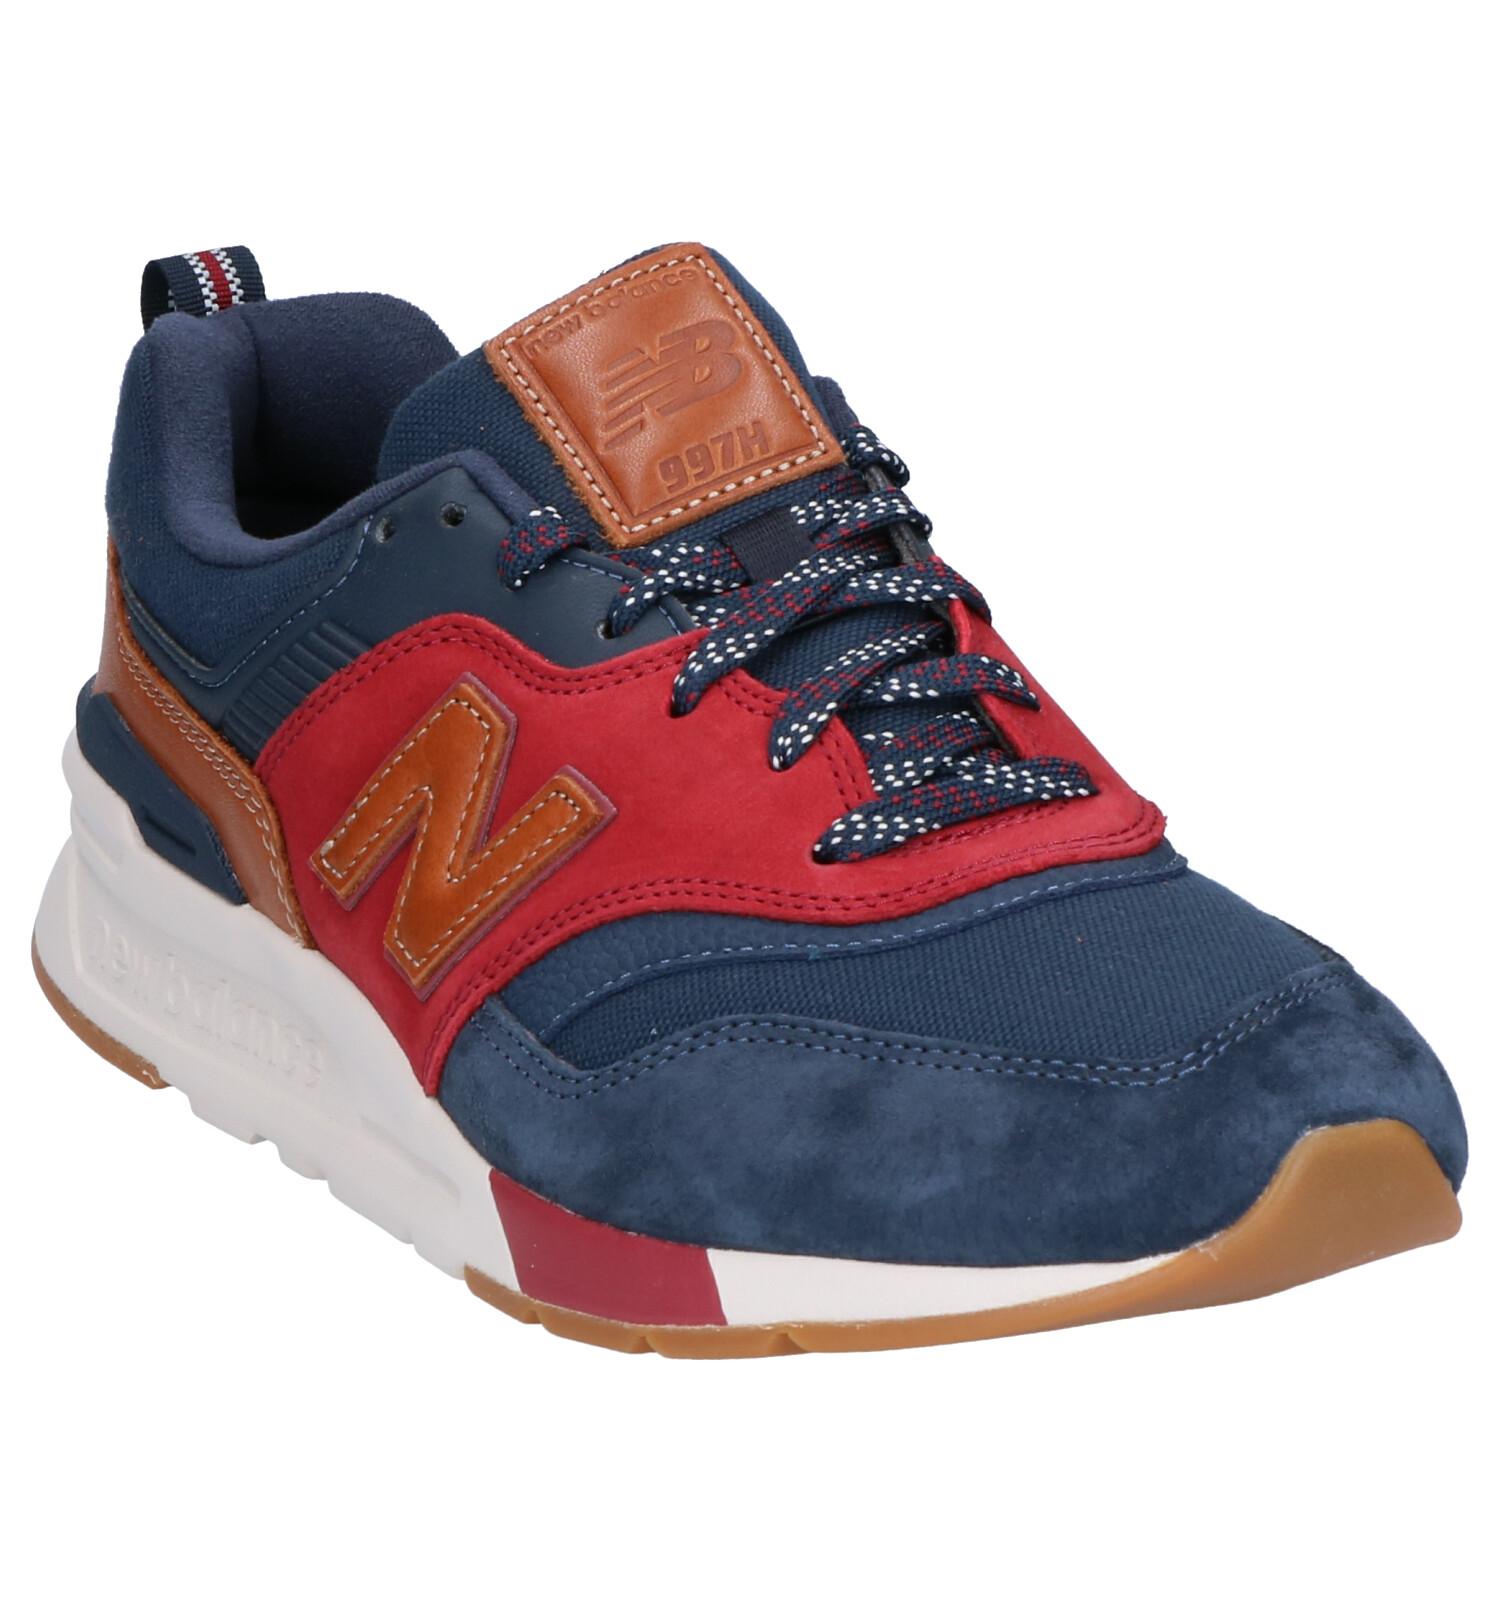 New Balance CM 997 Blauwe Sneakers   SCHOENENTORFS.NL ...